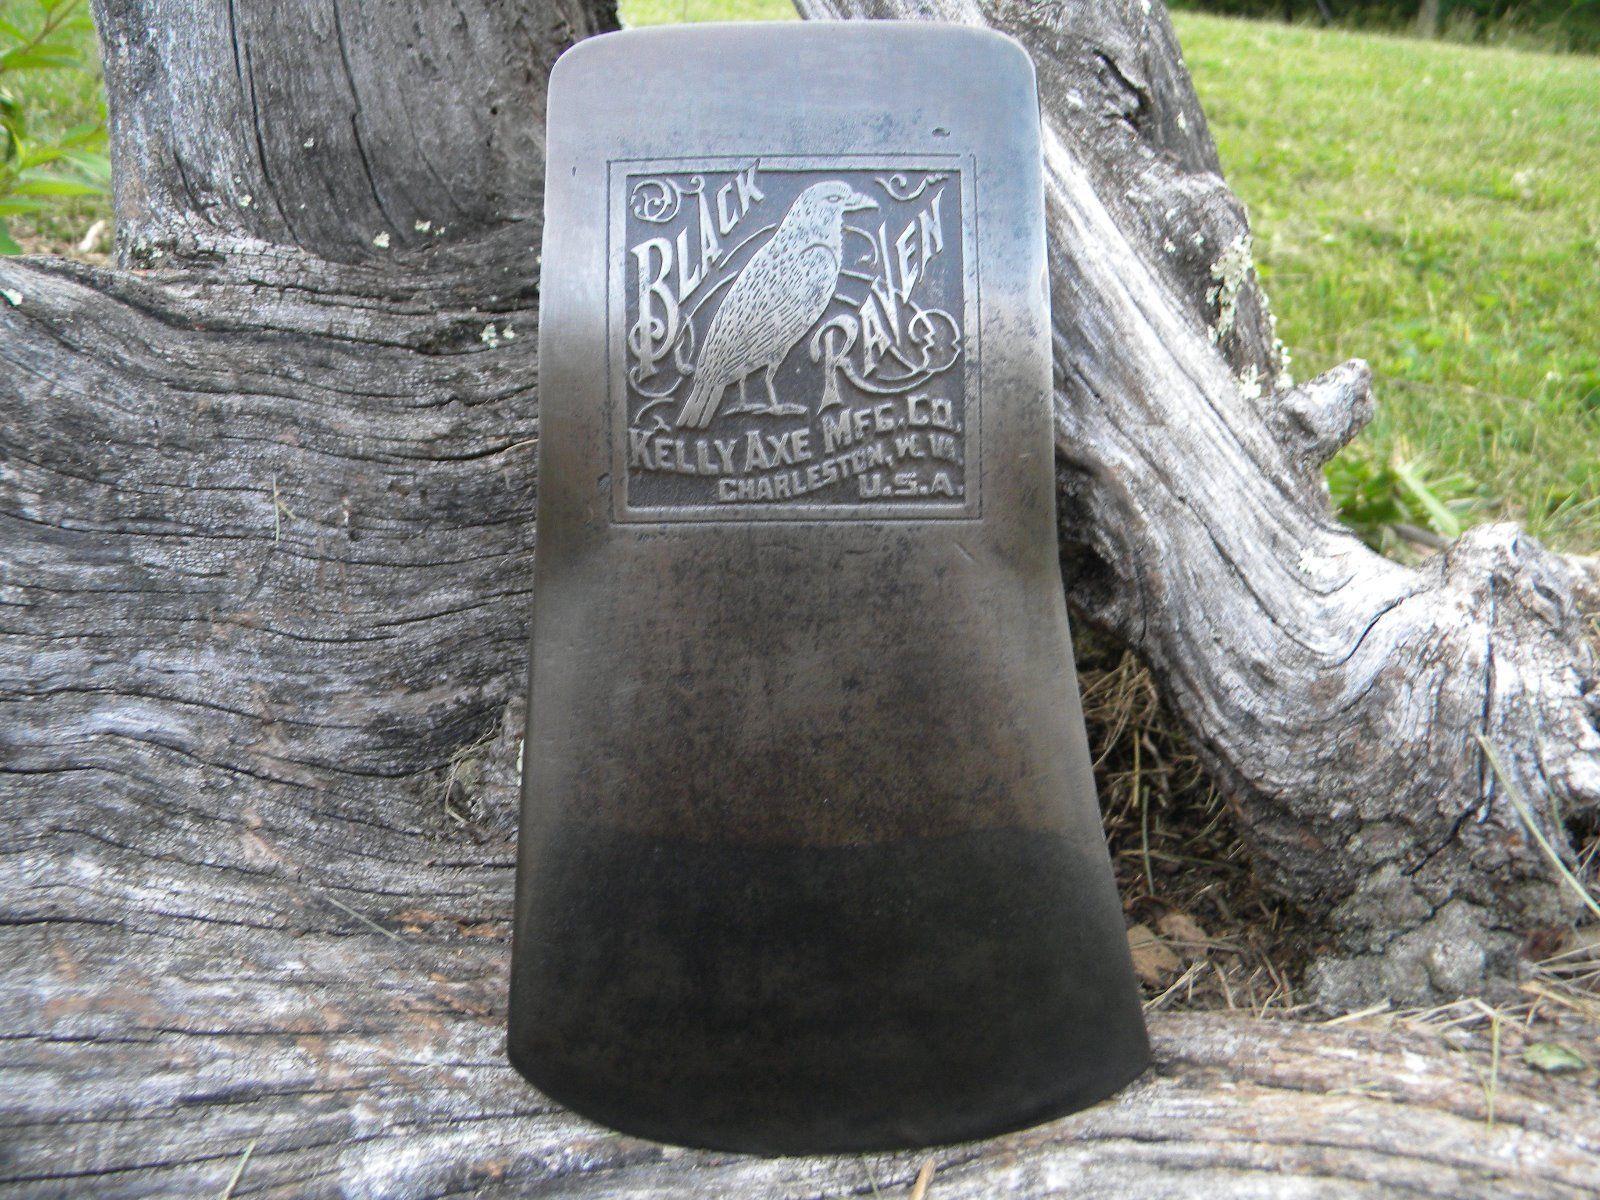 Vintage Embossed Black Raven Axe $850